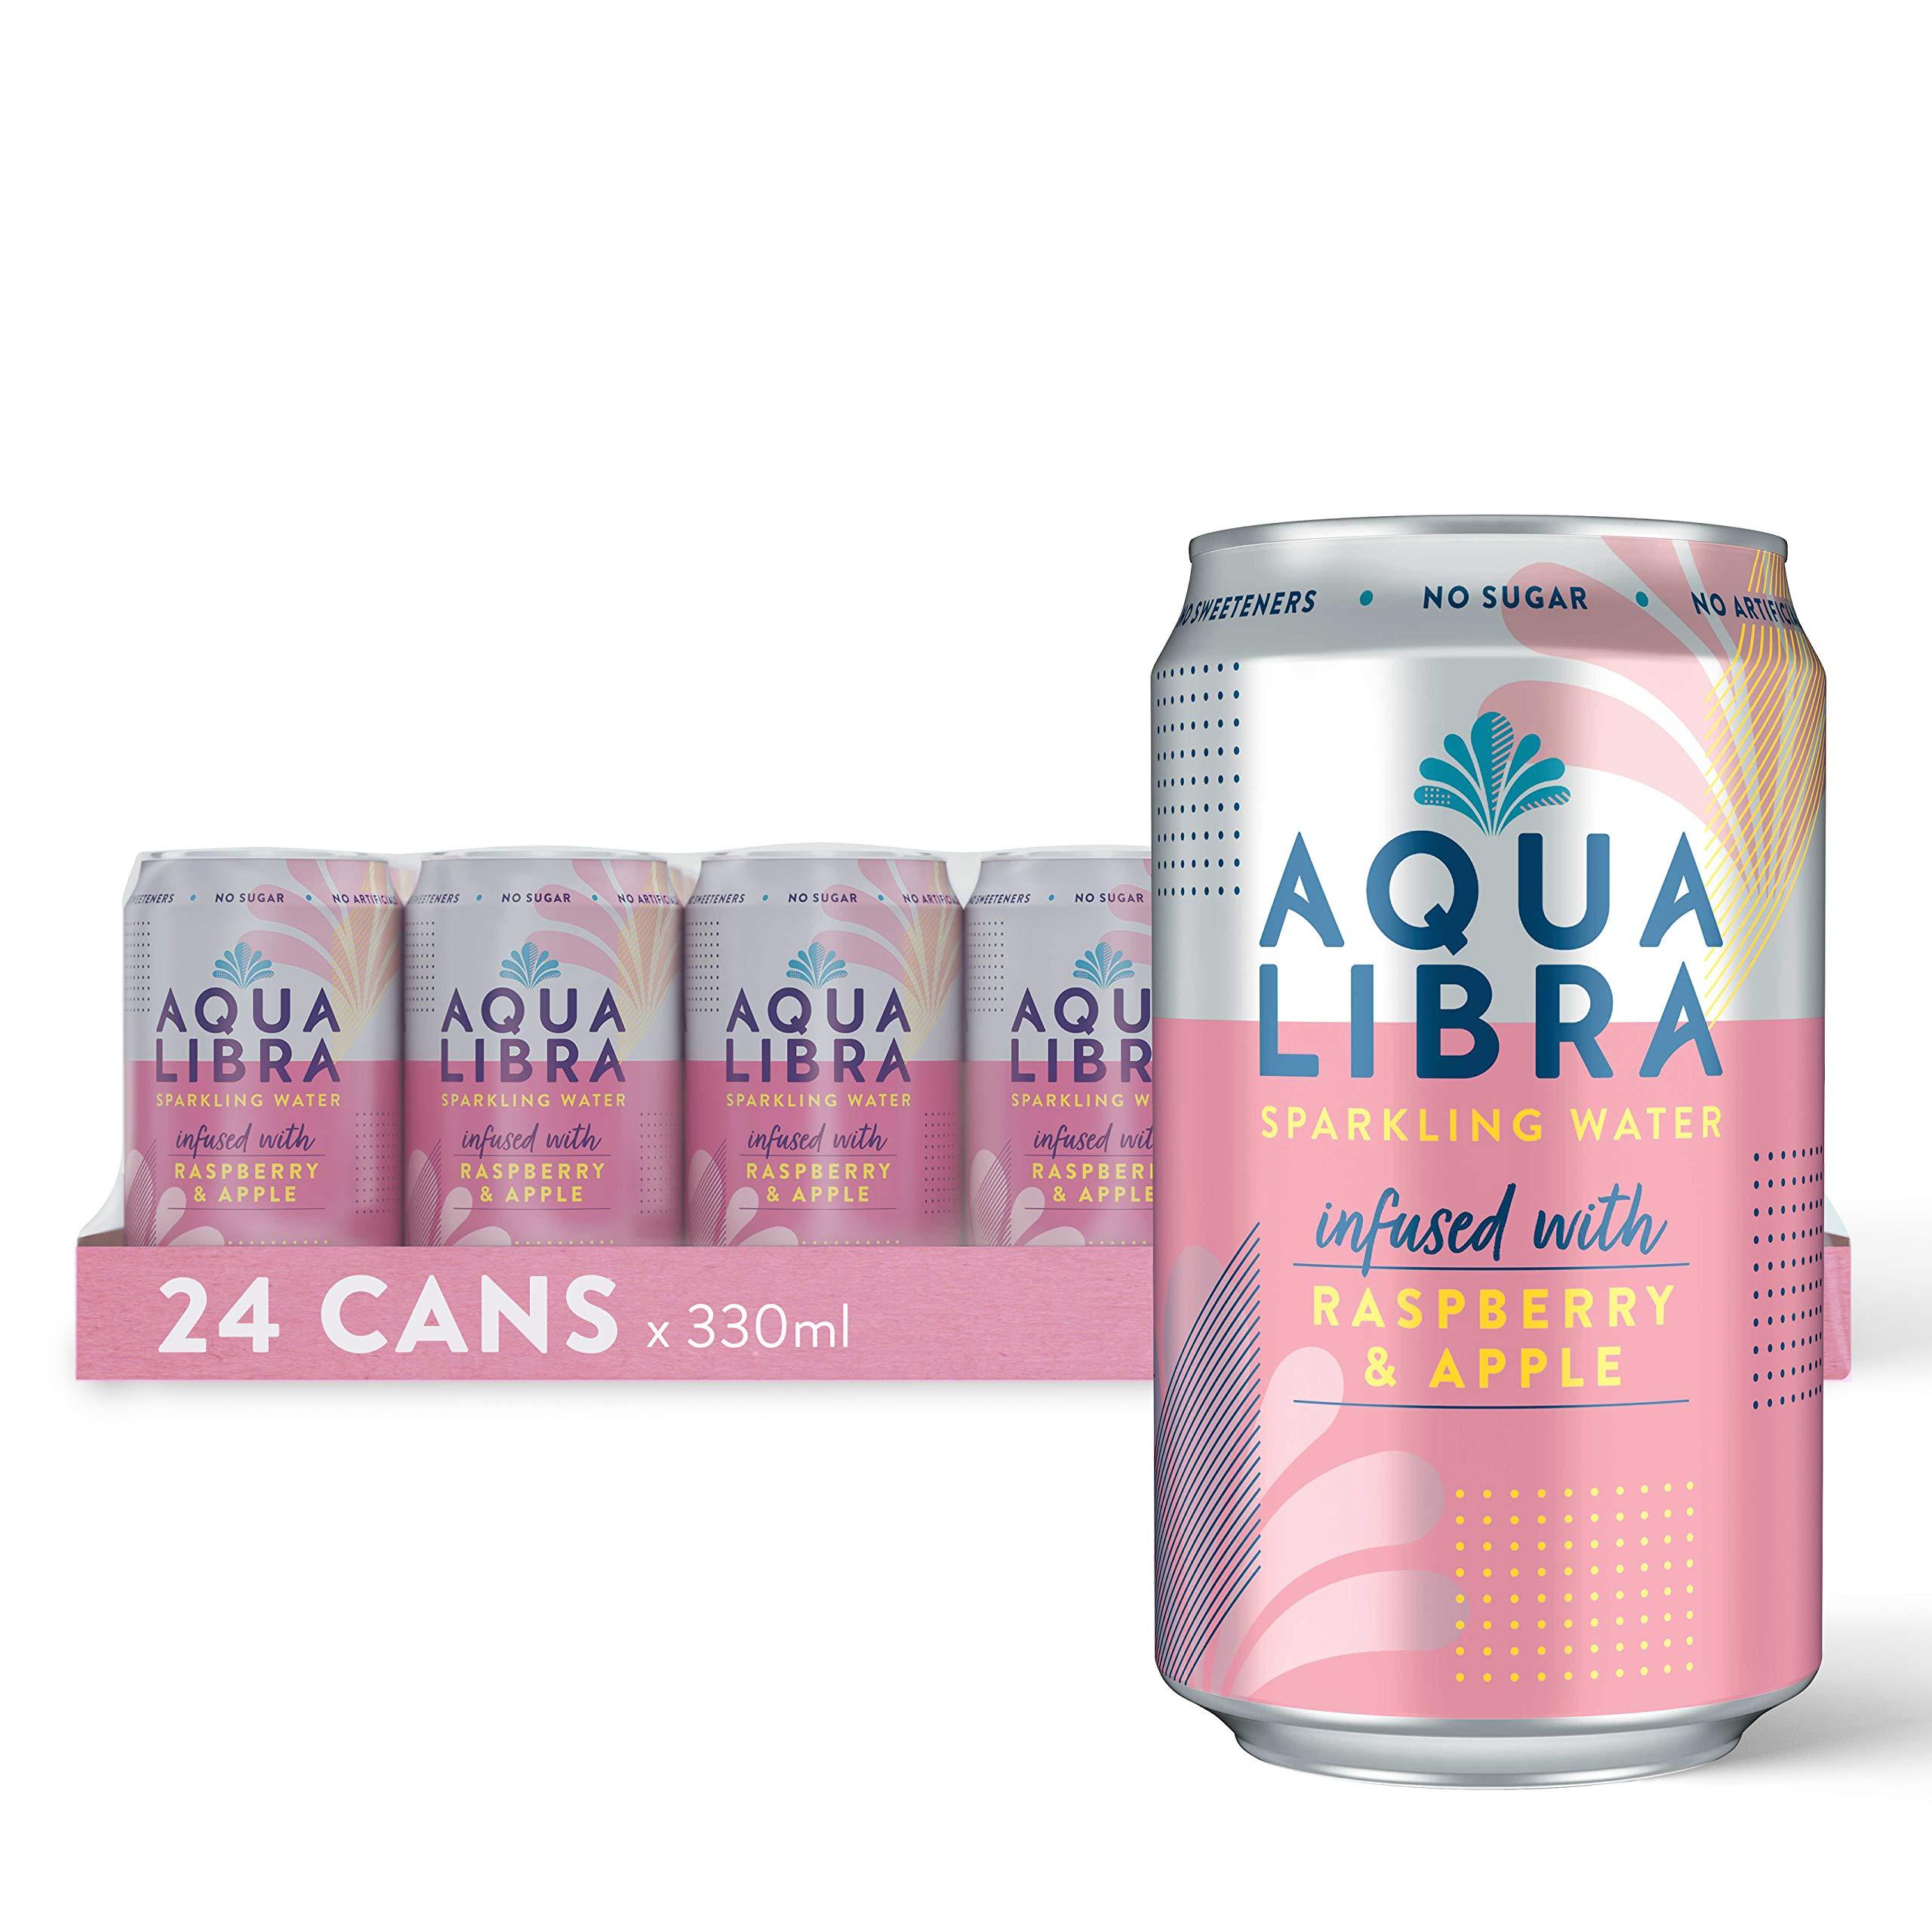 Aqua Libra Sparkling Water, Sugar Free Fruit Water, No Sugar, No Calories, Raspberry & Apple, 330 ml, Pack of 24 Cans